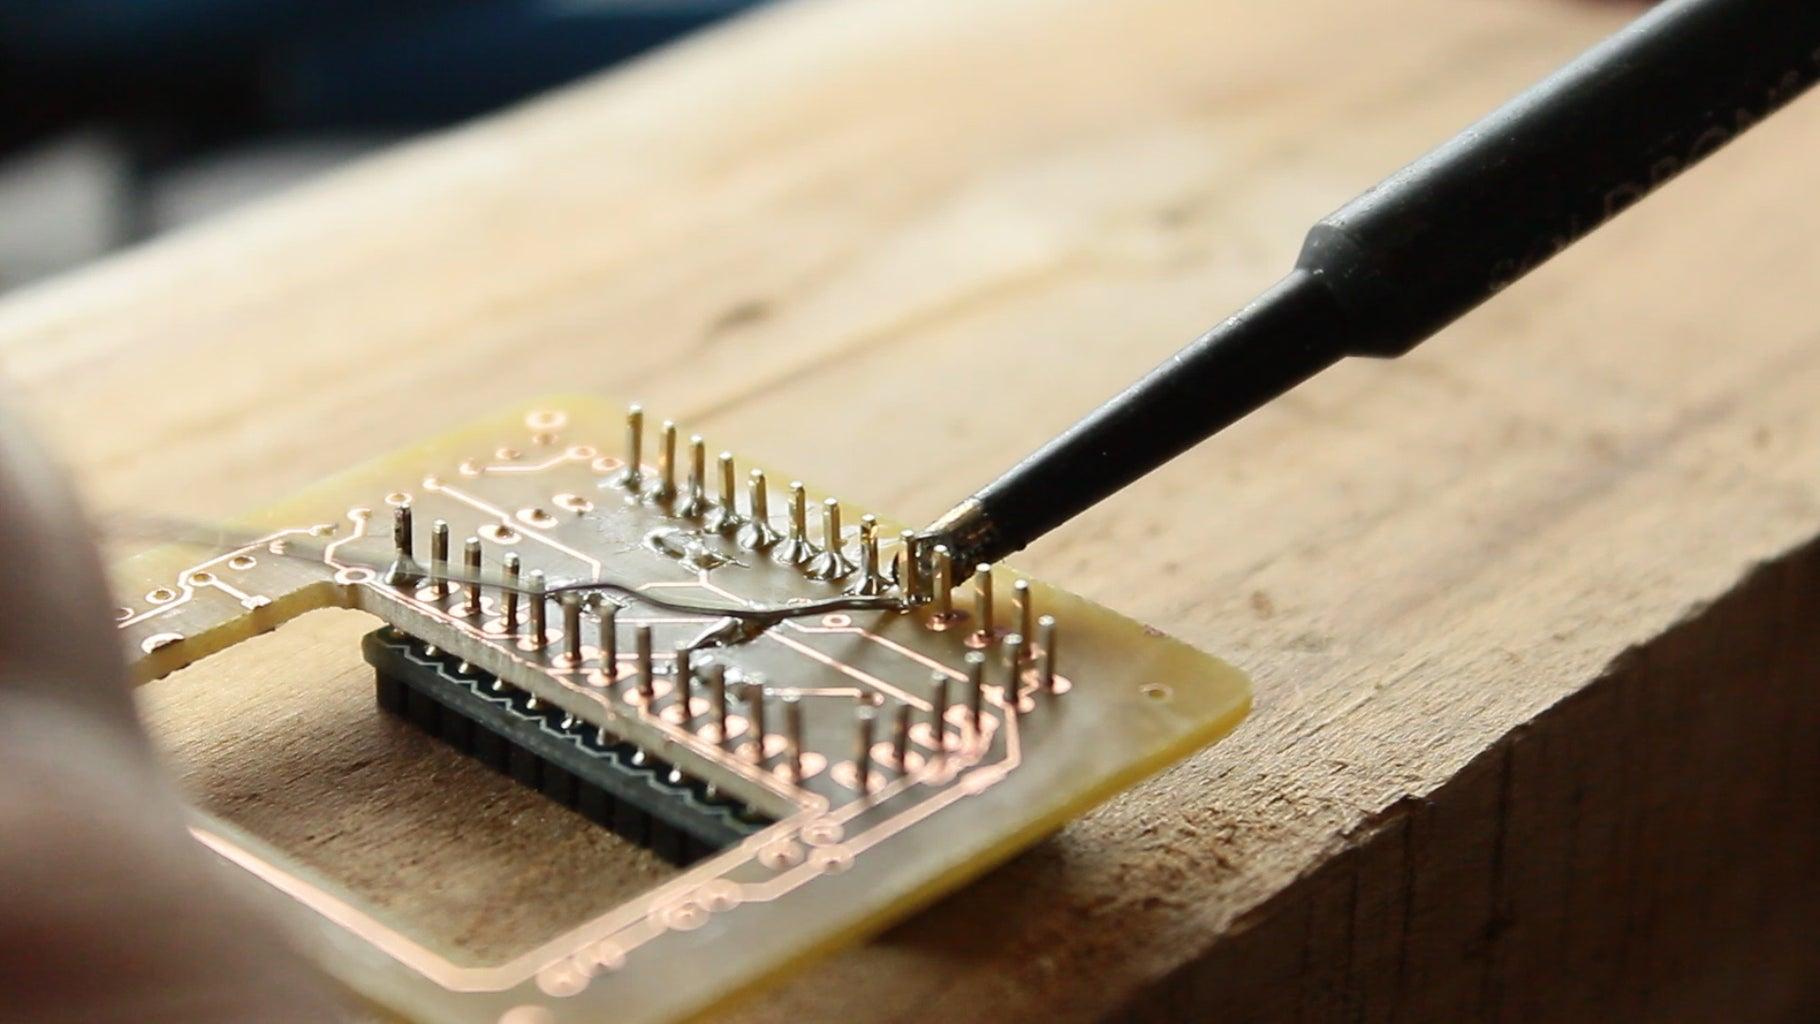 Solder the Arduino Pro Mini to the PCB